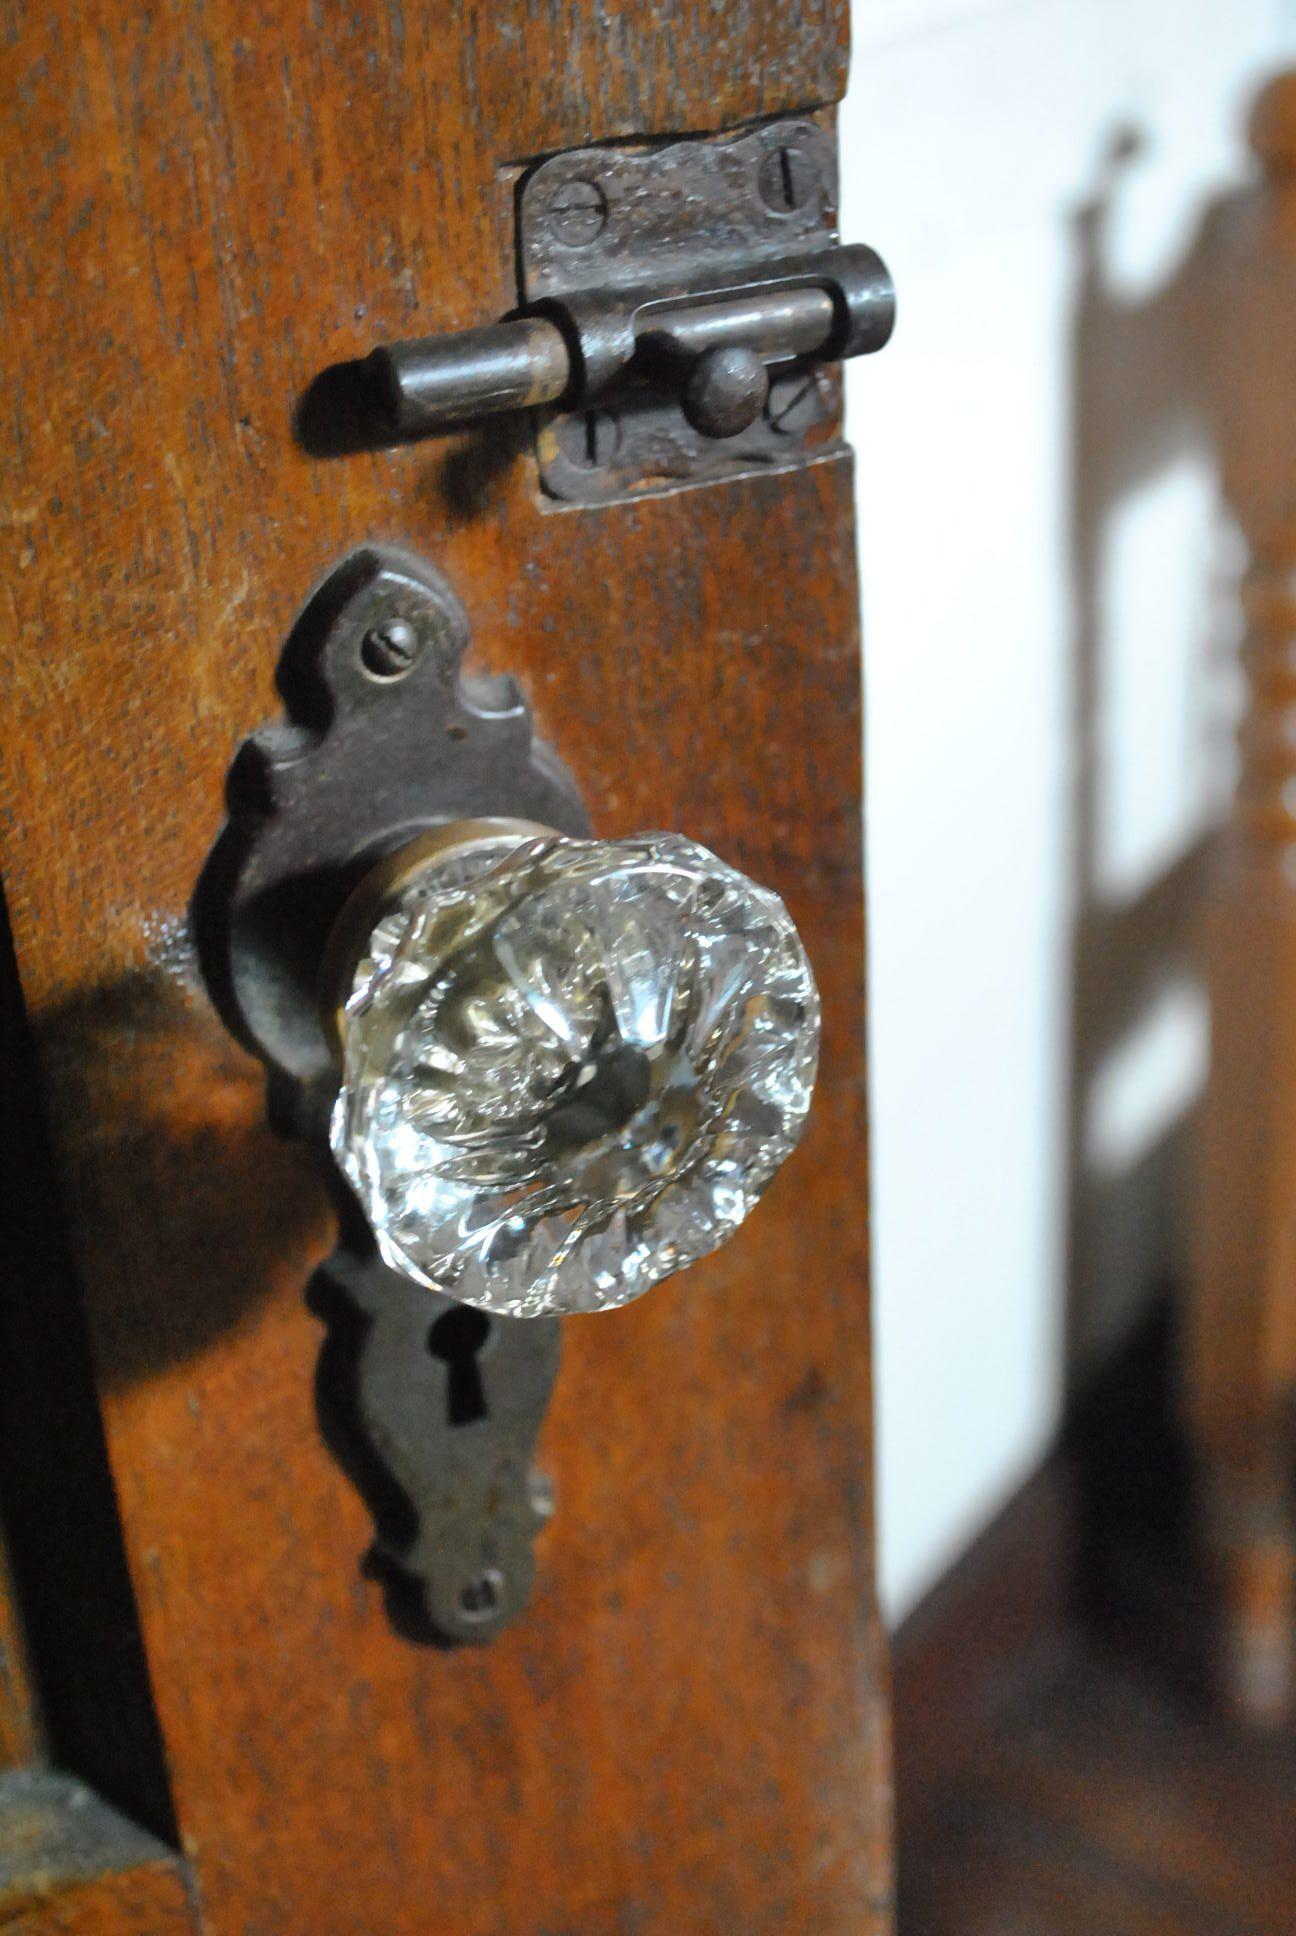 Attractive Antique Doorknob, Circa 1950s Had These In My Home As A Kid · Antique Door  KnobsGlass ...